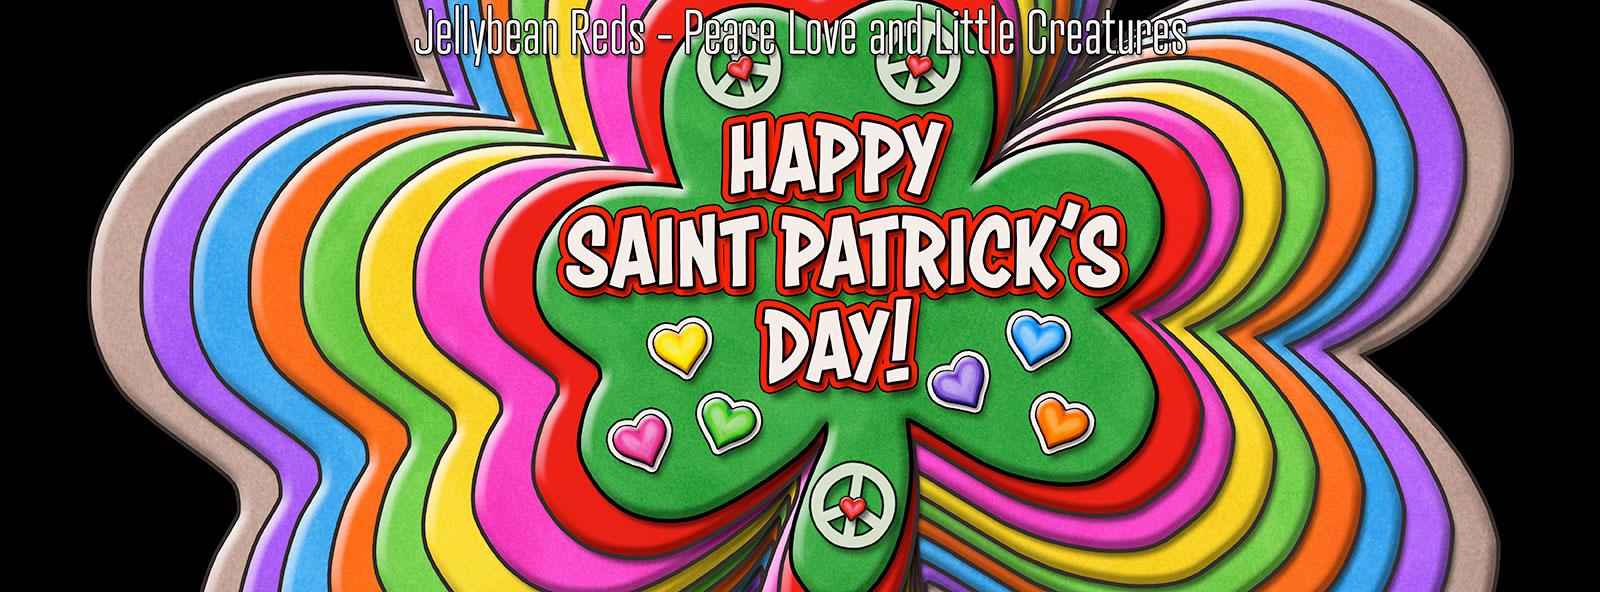 Happy Saint Patrick's Day - Rainbow Shamrocks with Peace Signs and Hearts